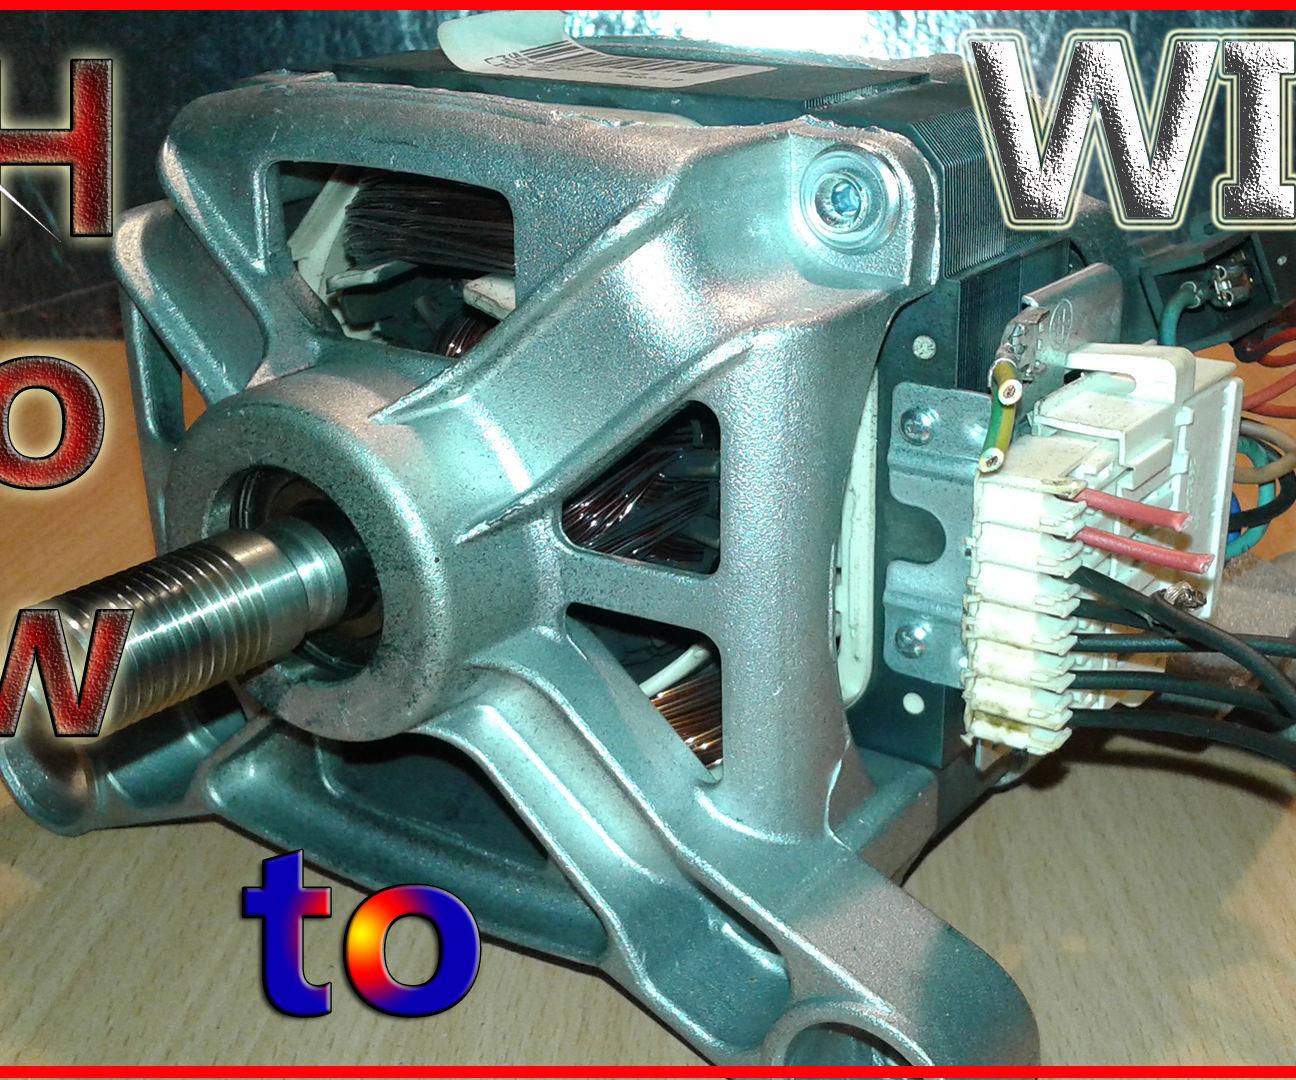 Washing Machine Motor Wiring Basics: 3 Steps on